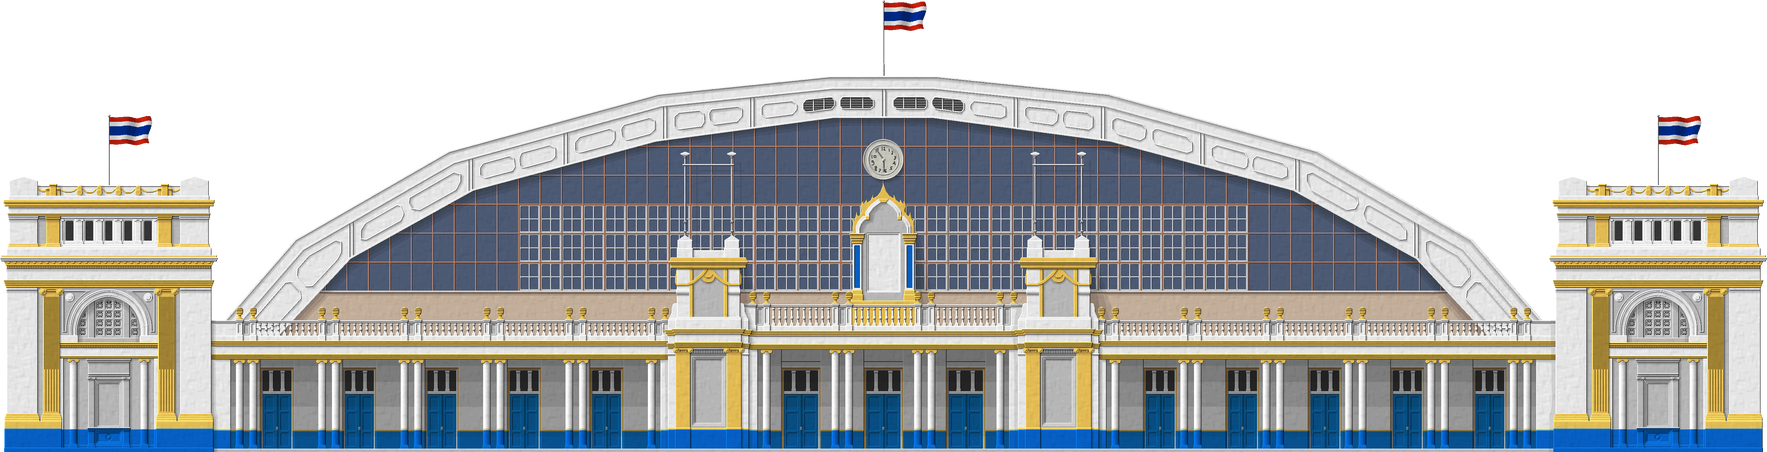 Bangkok Railway Station by Herbertrocha